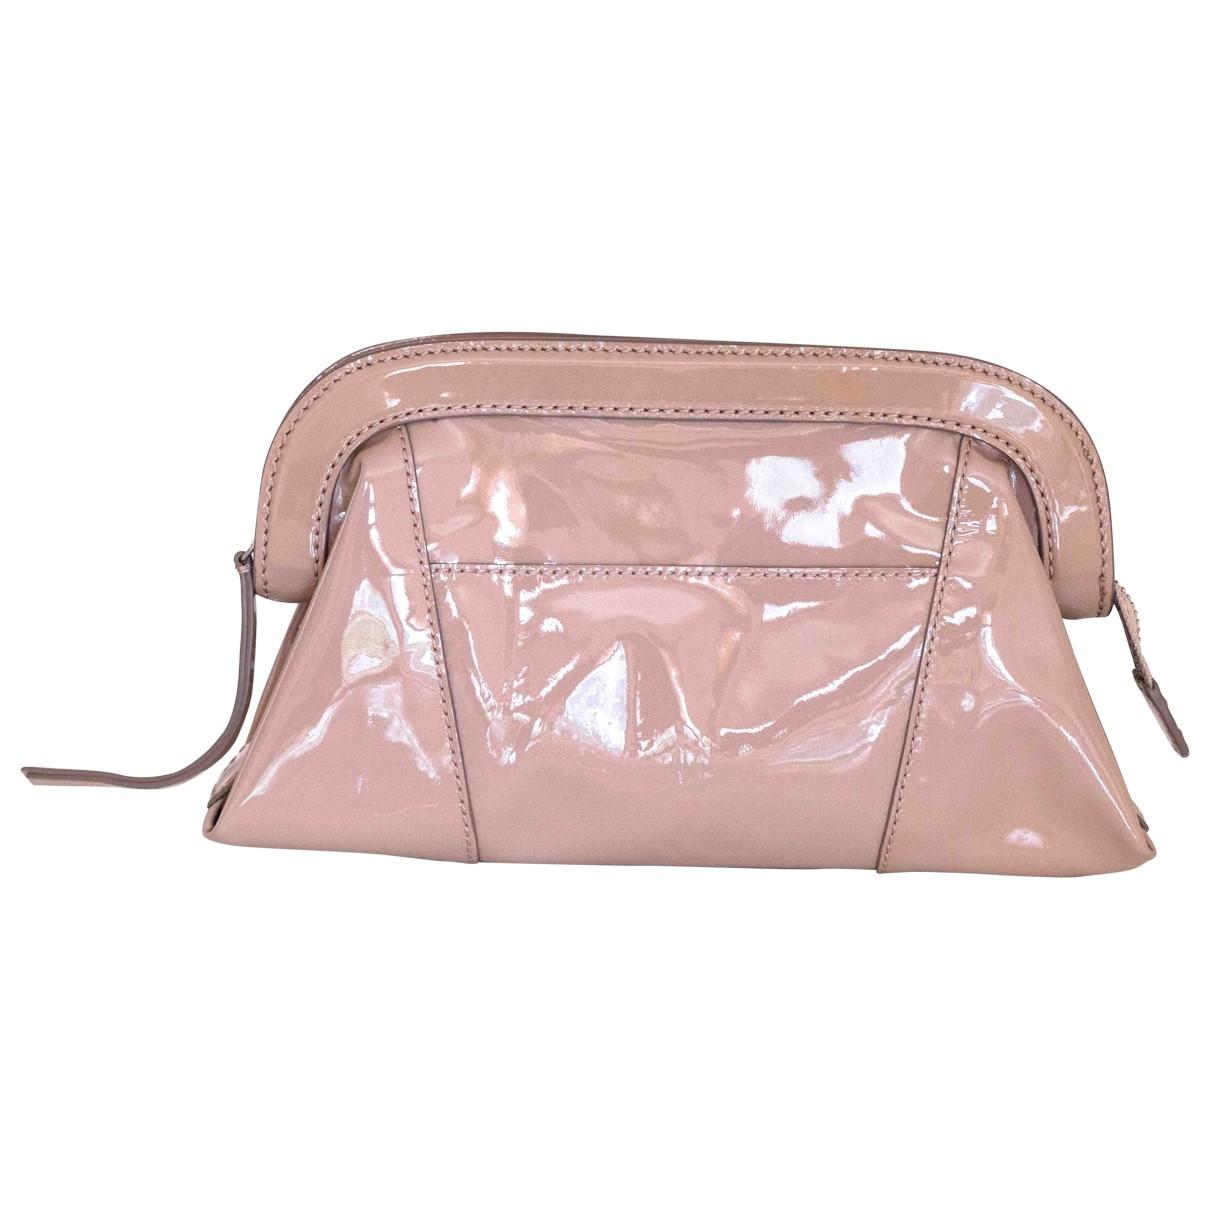 Club Monaco \N Pink Leather Clutch bag for Women \N